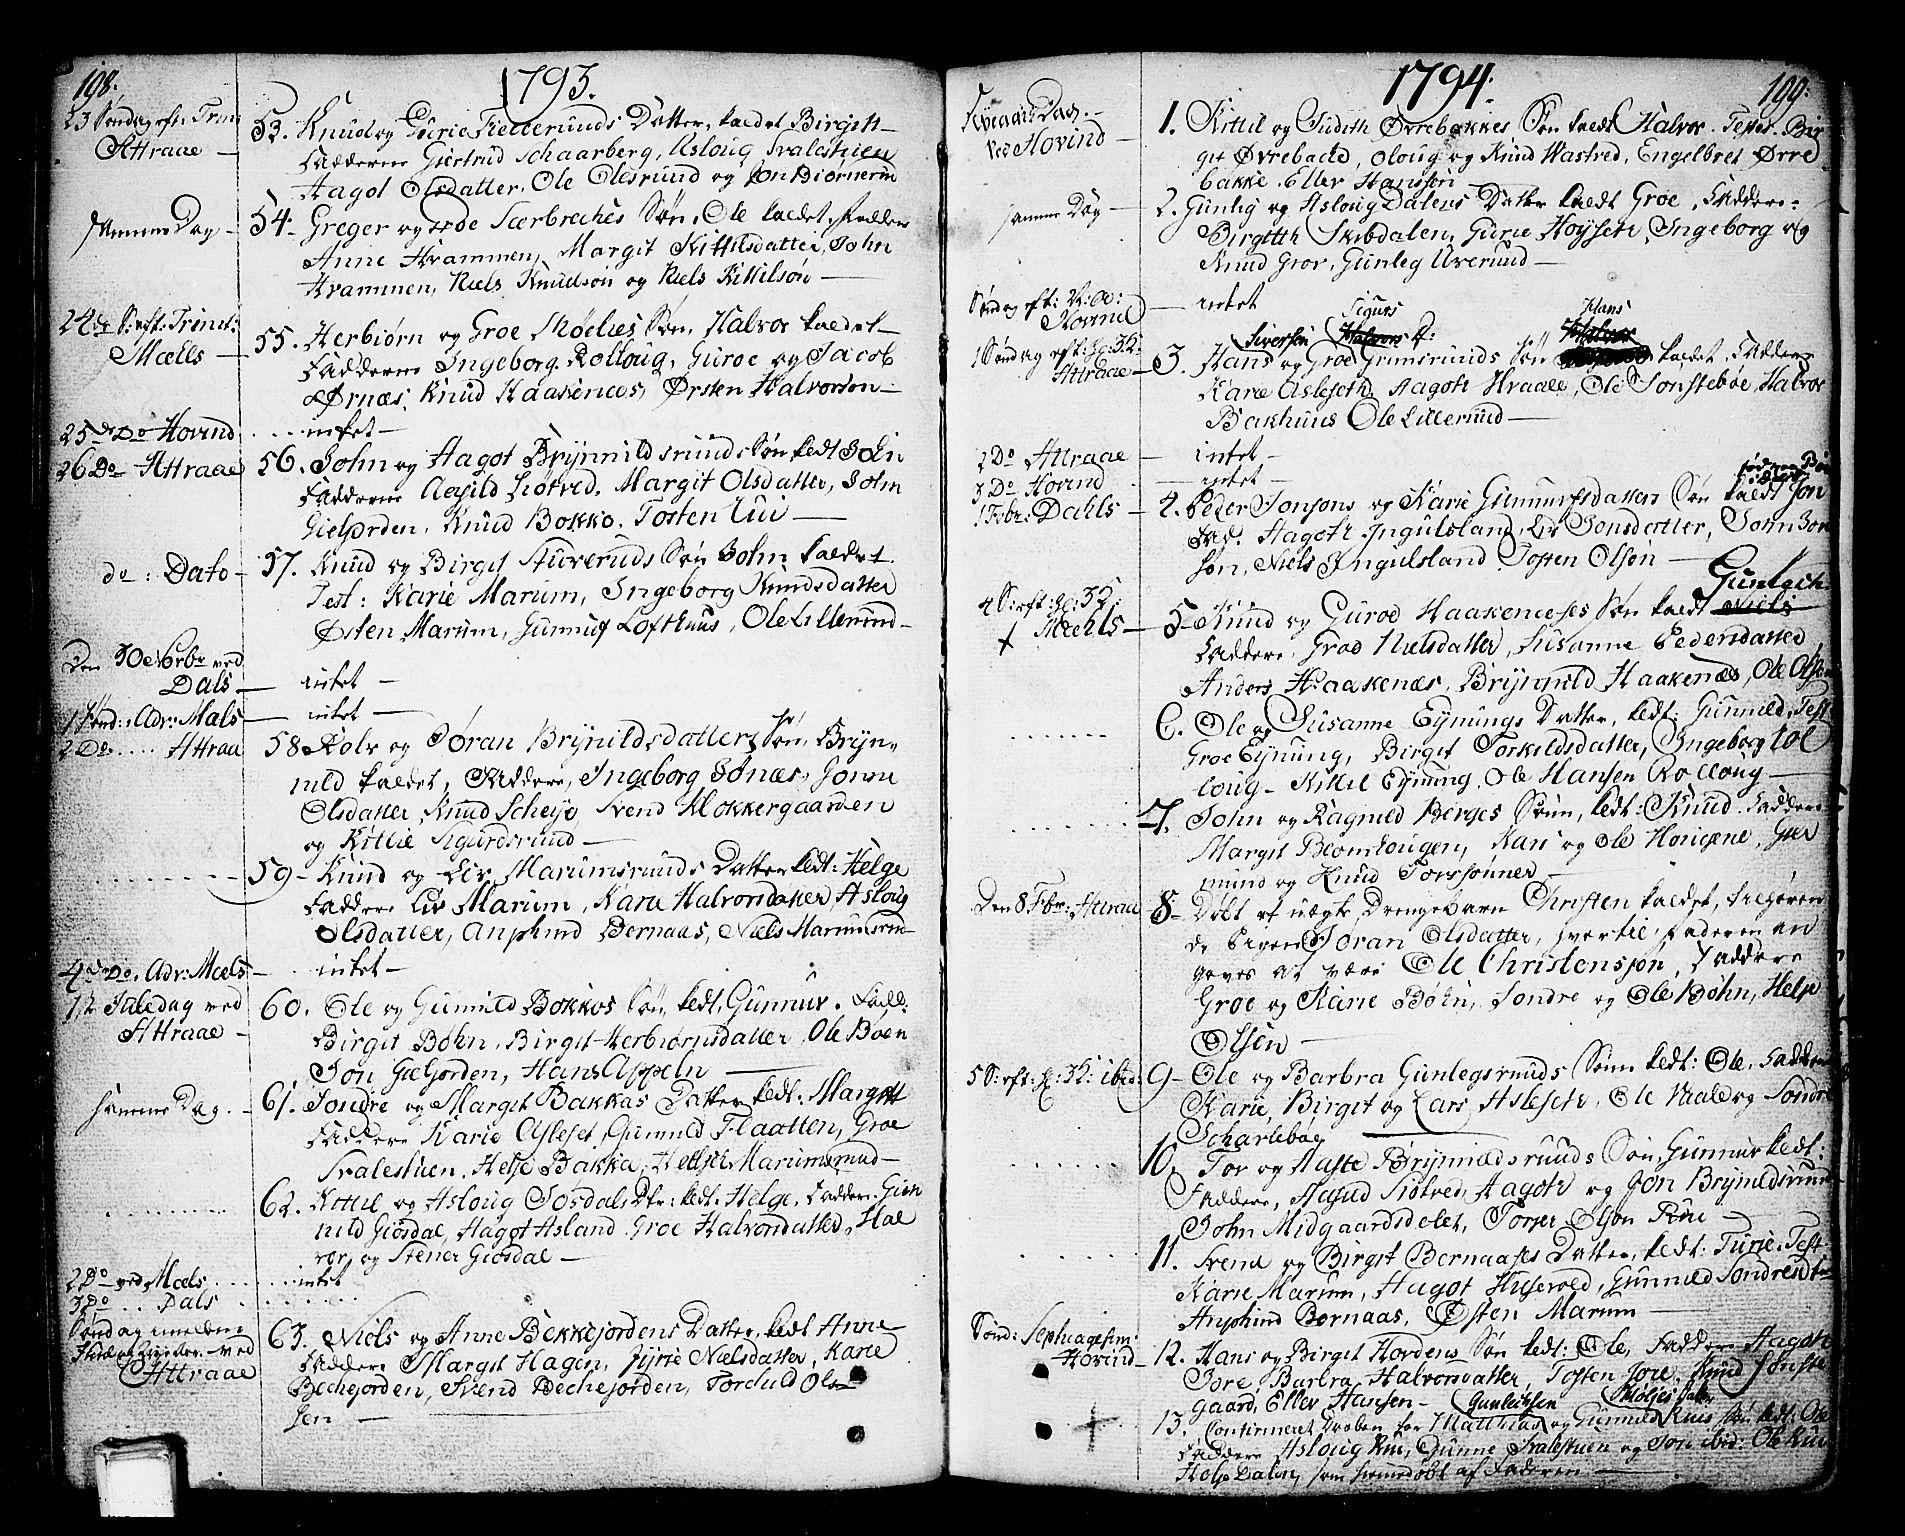 SAKO, Tinn kirkebøker, F/Fa/L0002: Ministerialbok nr. I 2, 1757-1810, s. 198-199